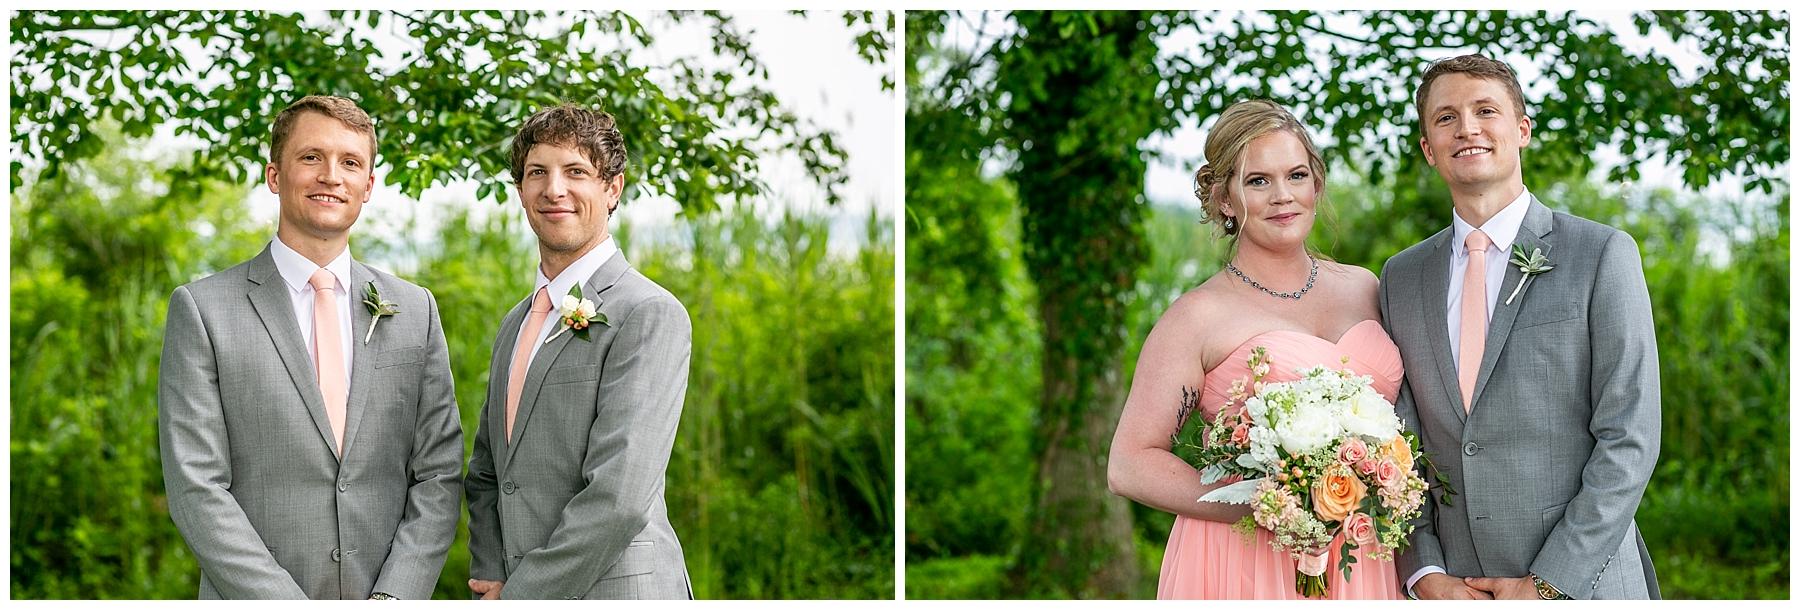 Chelsea Phil Bohemia River Overlook Wedding Living Radiant Photography photos_0075.jpg